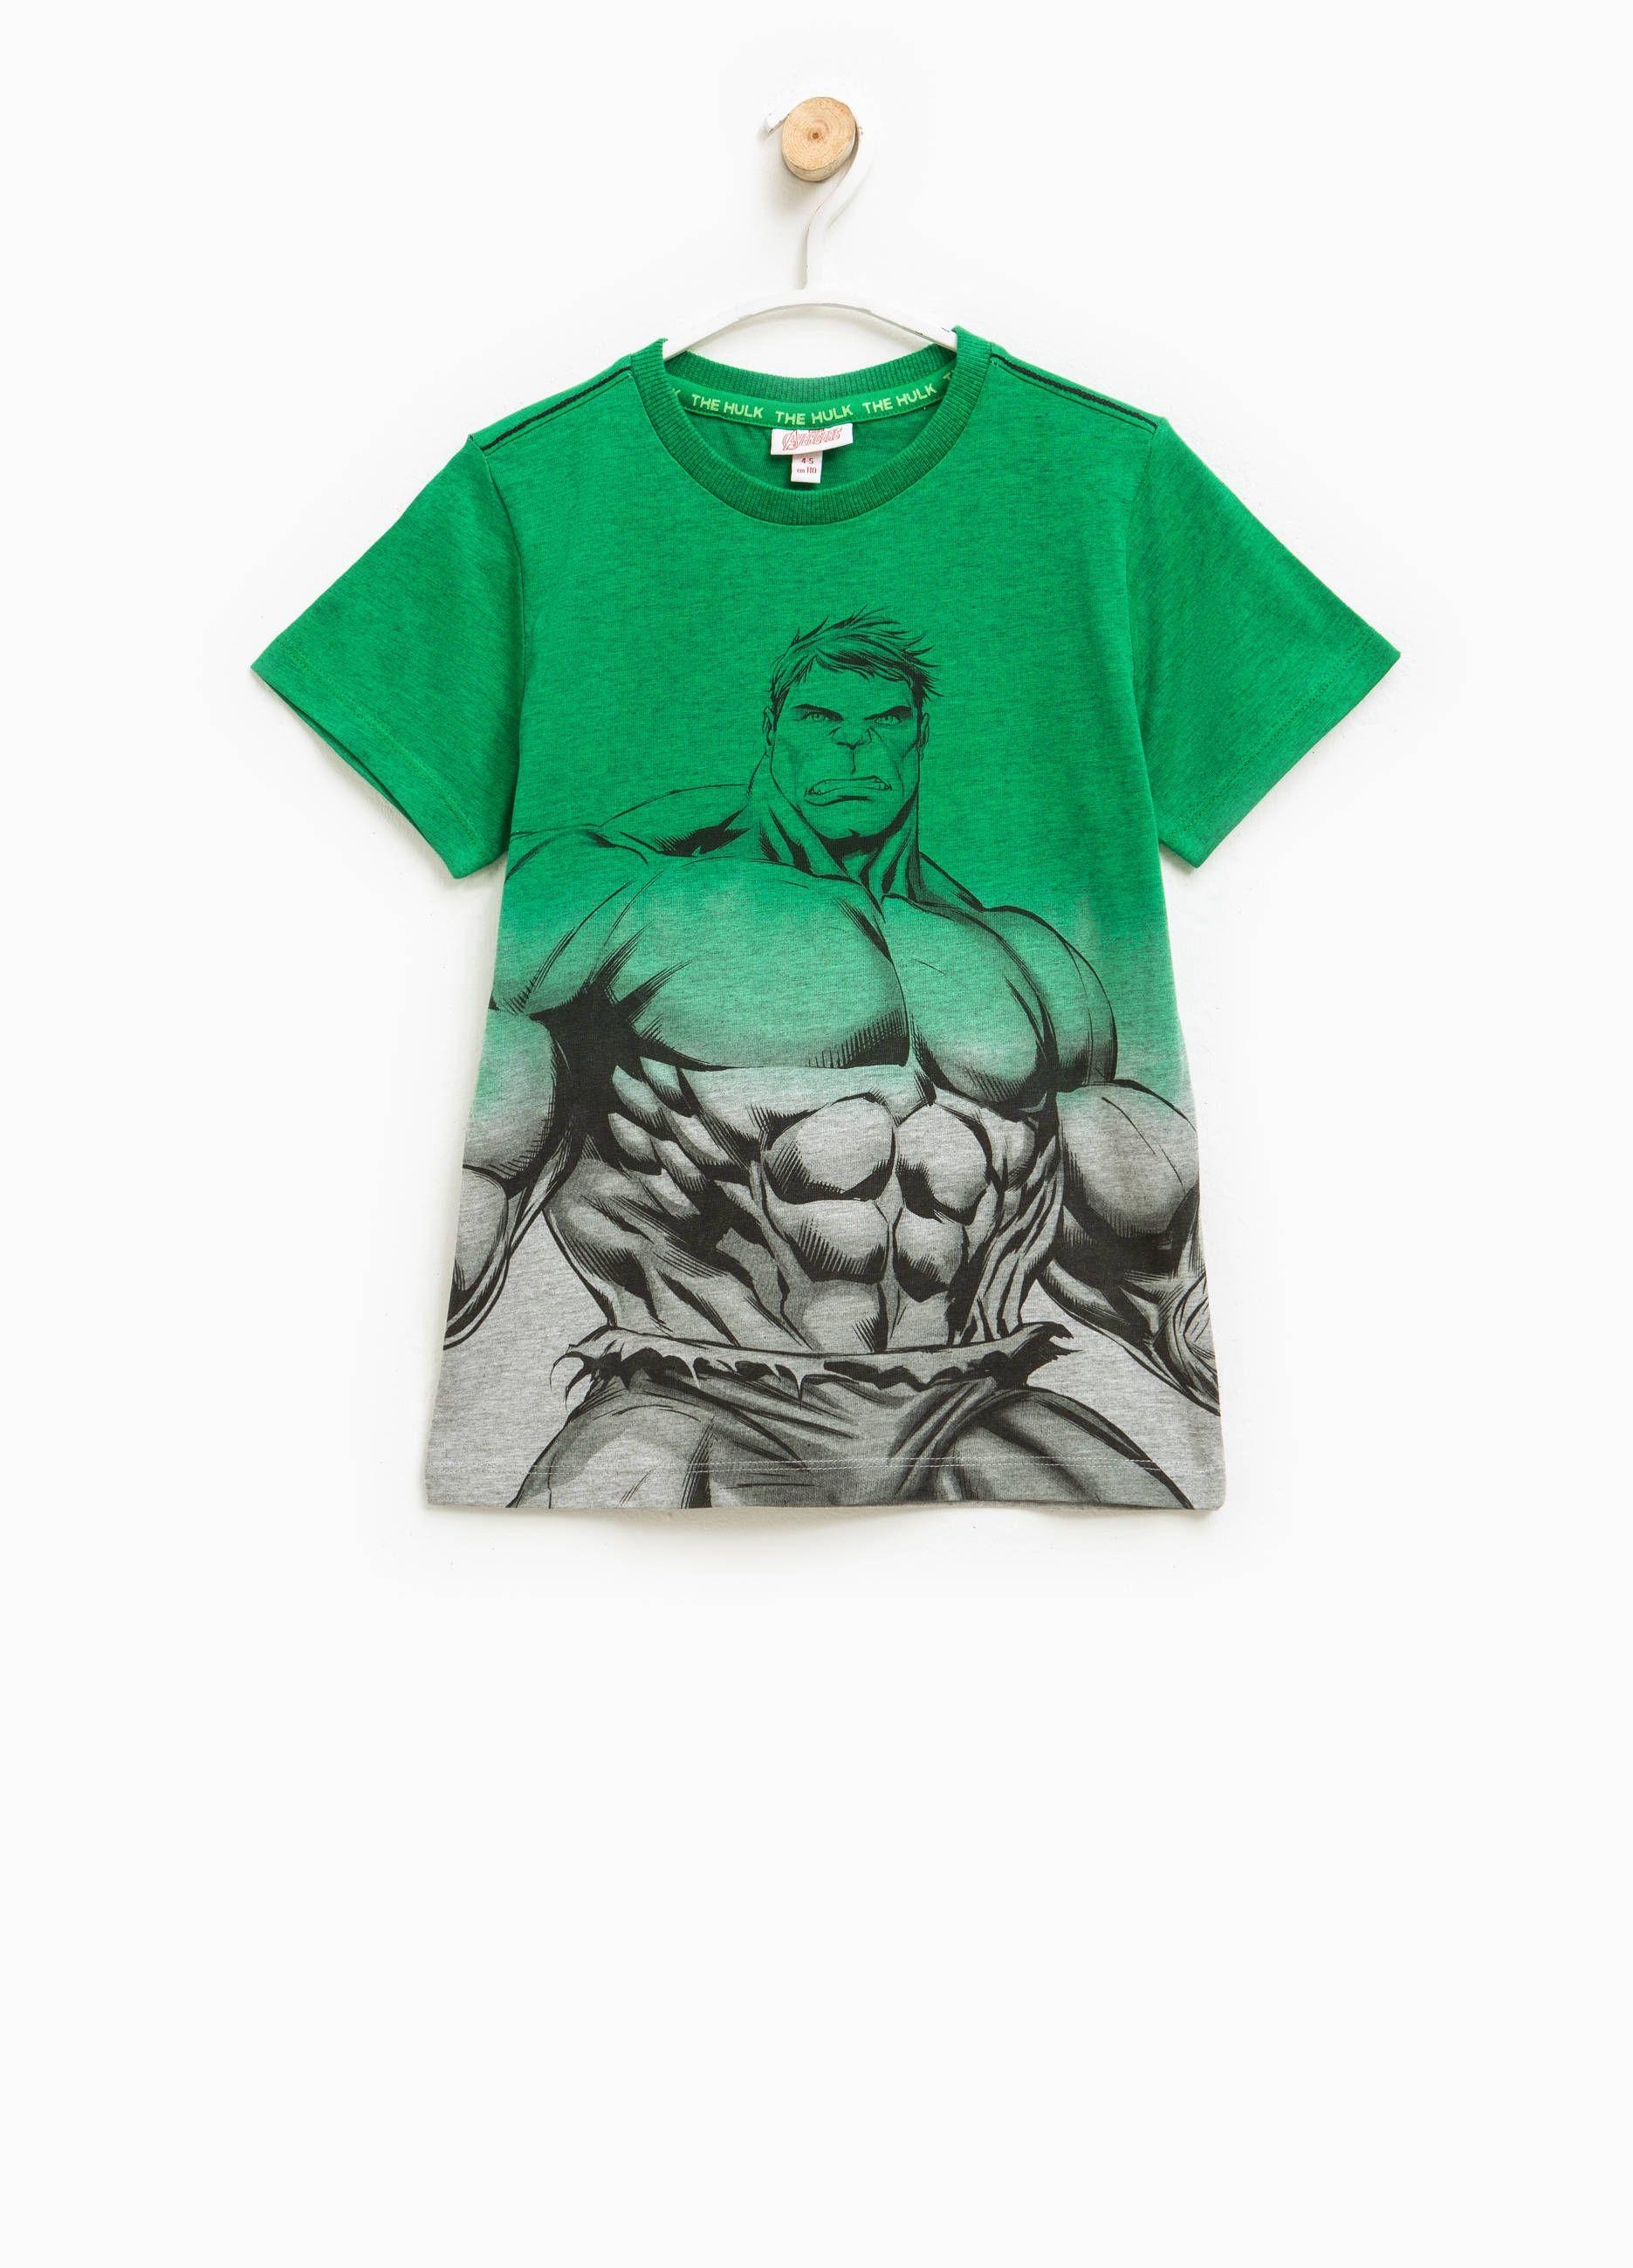 Hulk Mode On Boys Short-Sleeve T-Shirts